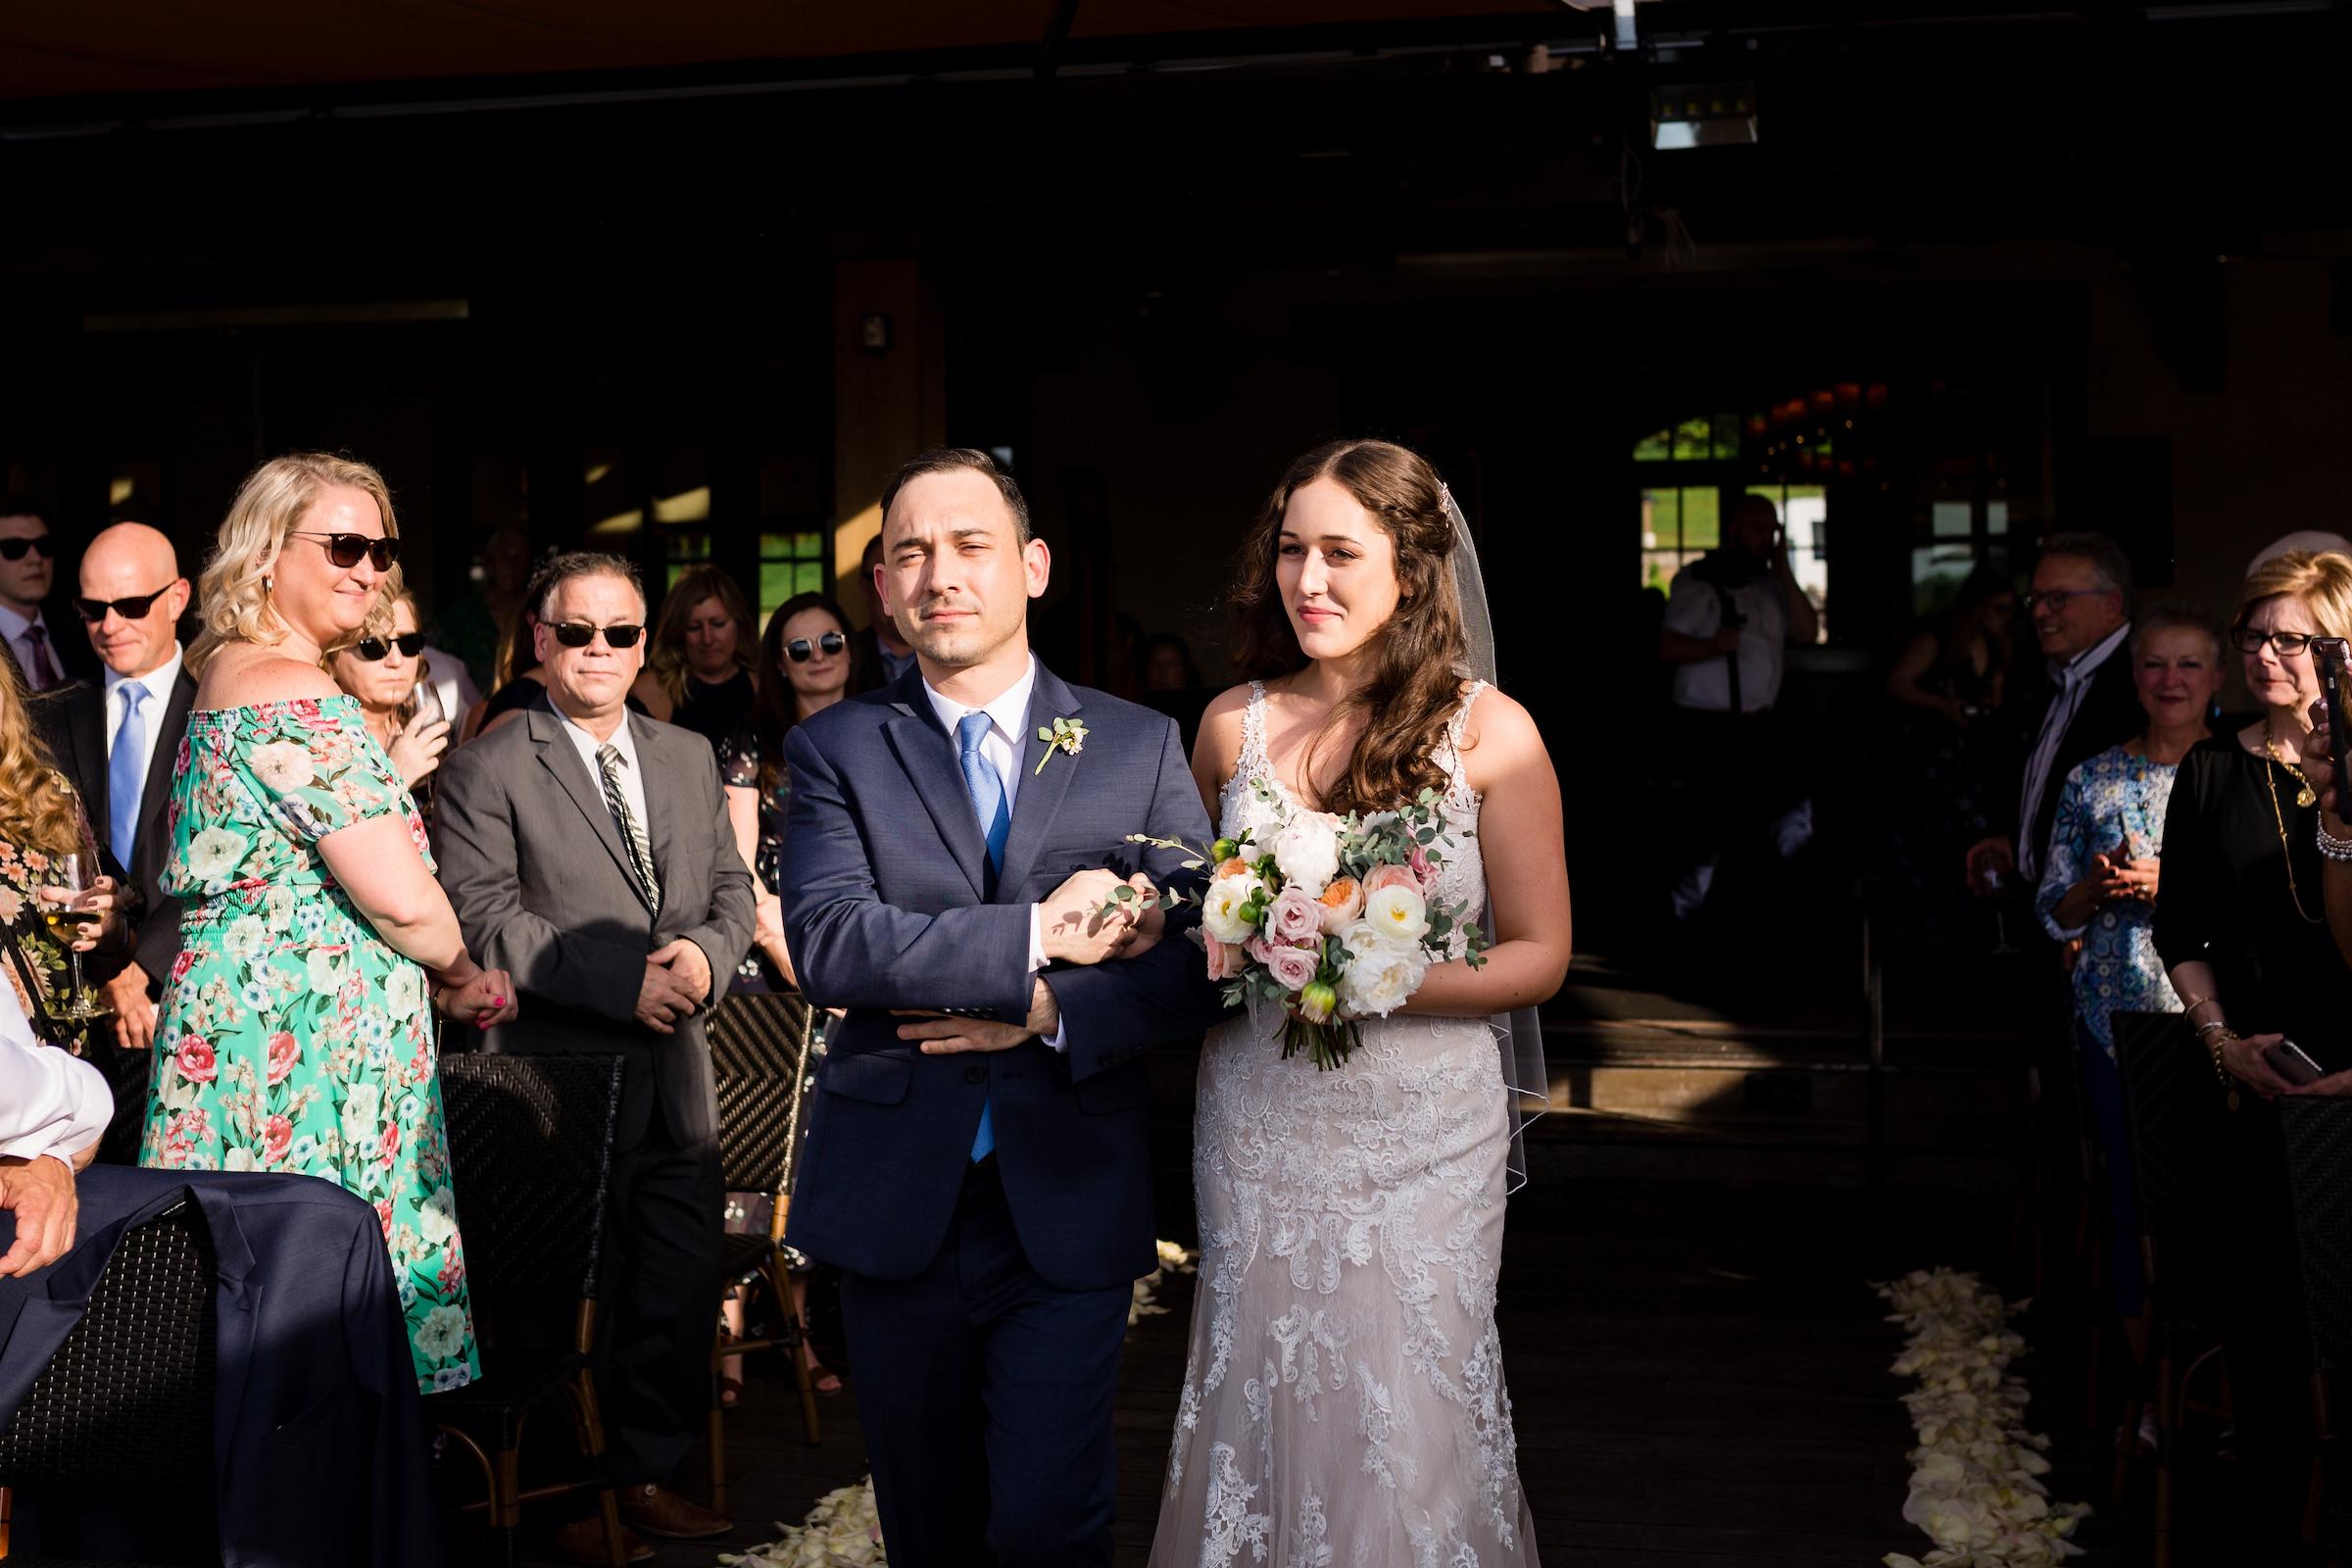 brielle-davis-events-kairos-photography-chandler-hill-wedding-ceremony-445.jpg